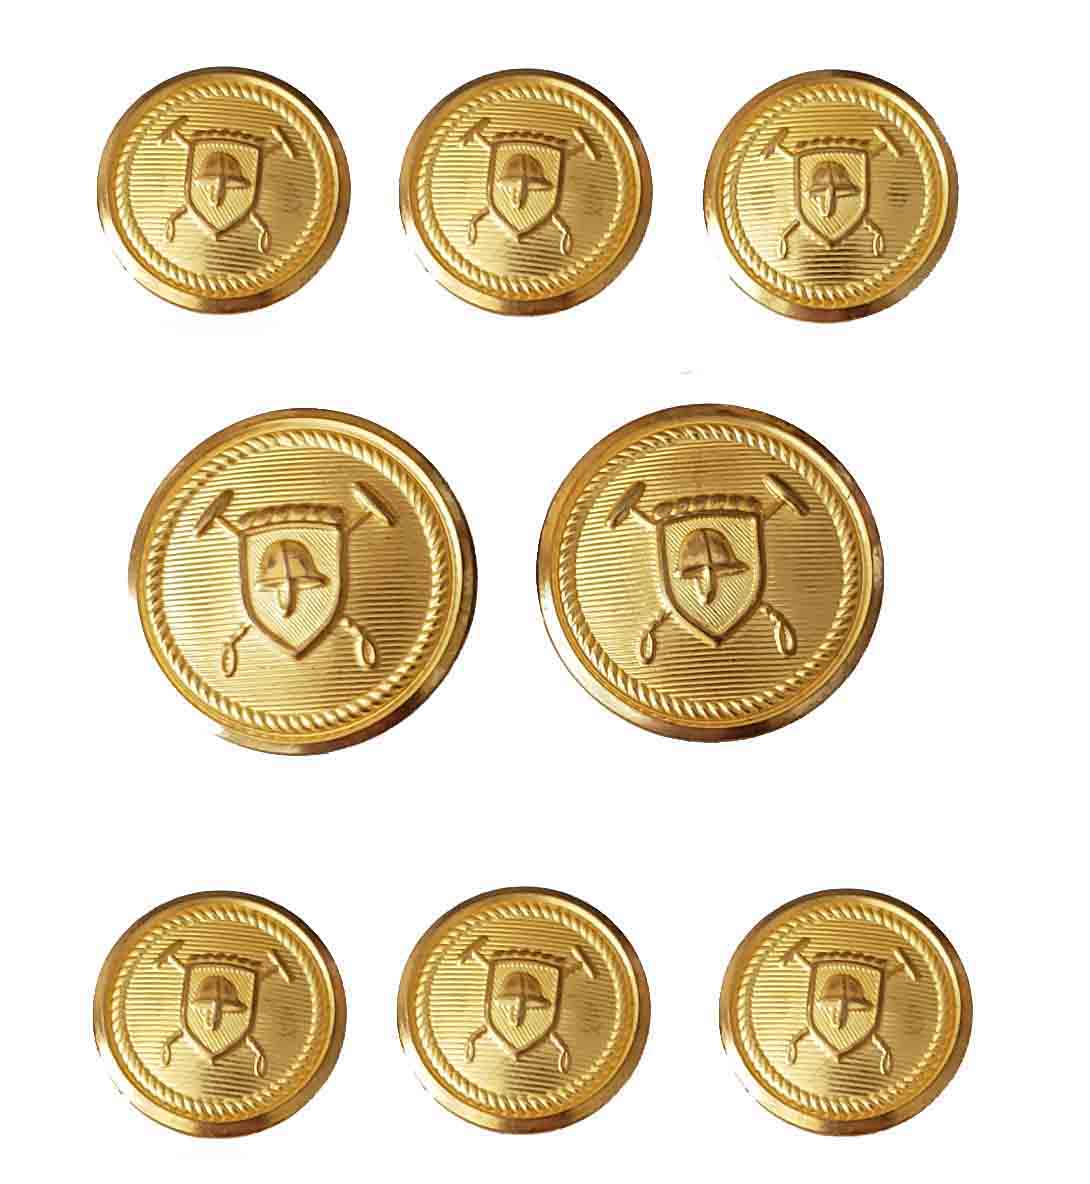 Vintage 1990s Polo Ralph Lauren by Waterbury Blazer Buttons Set Gold Brass Helmet Shield Men's